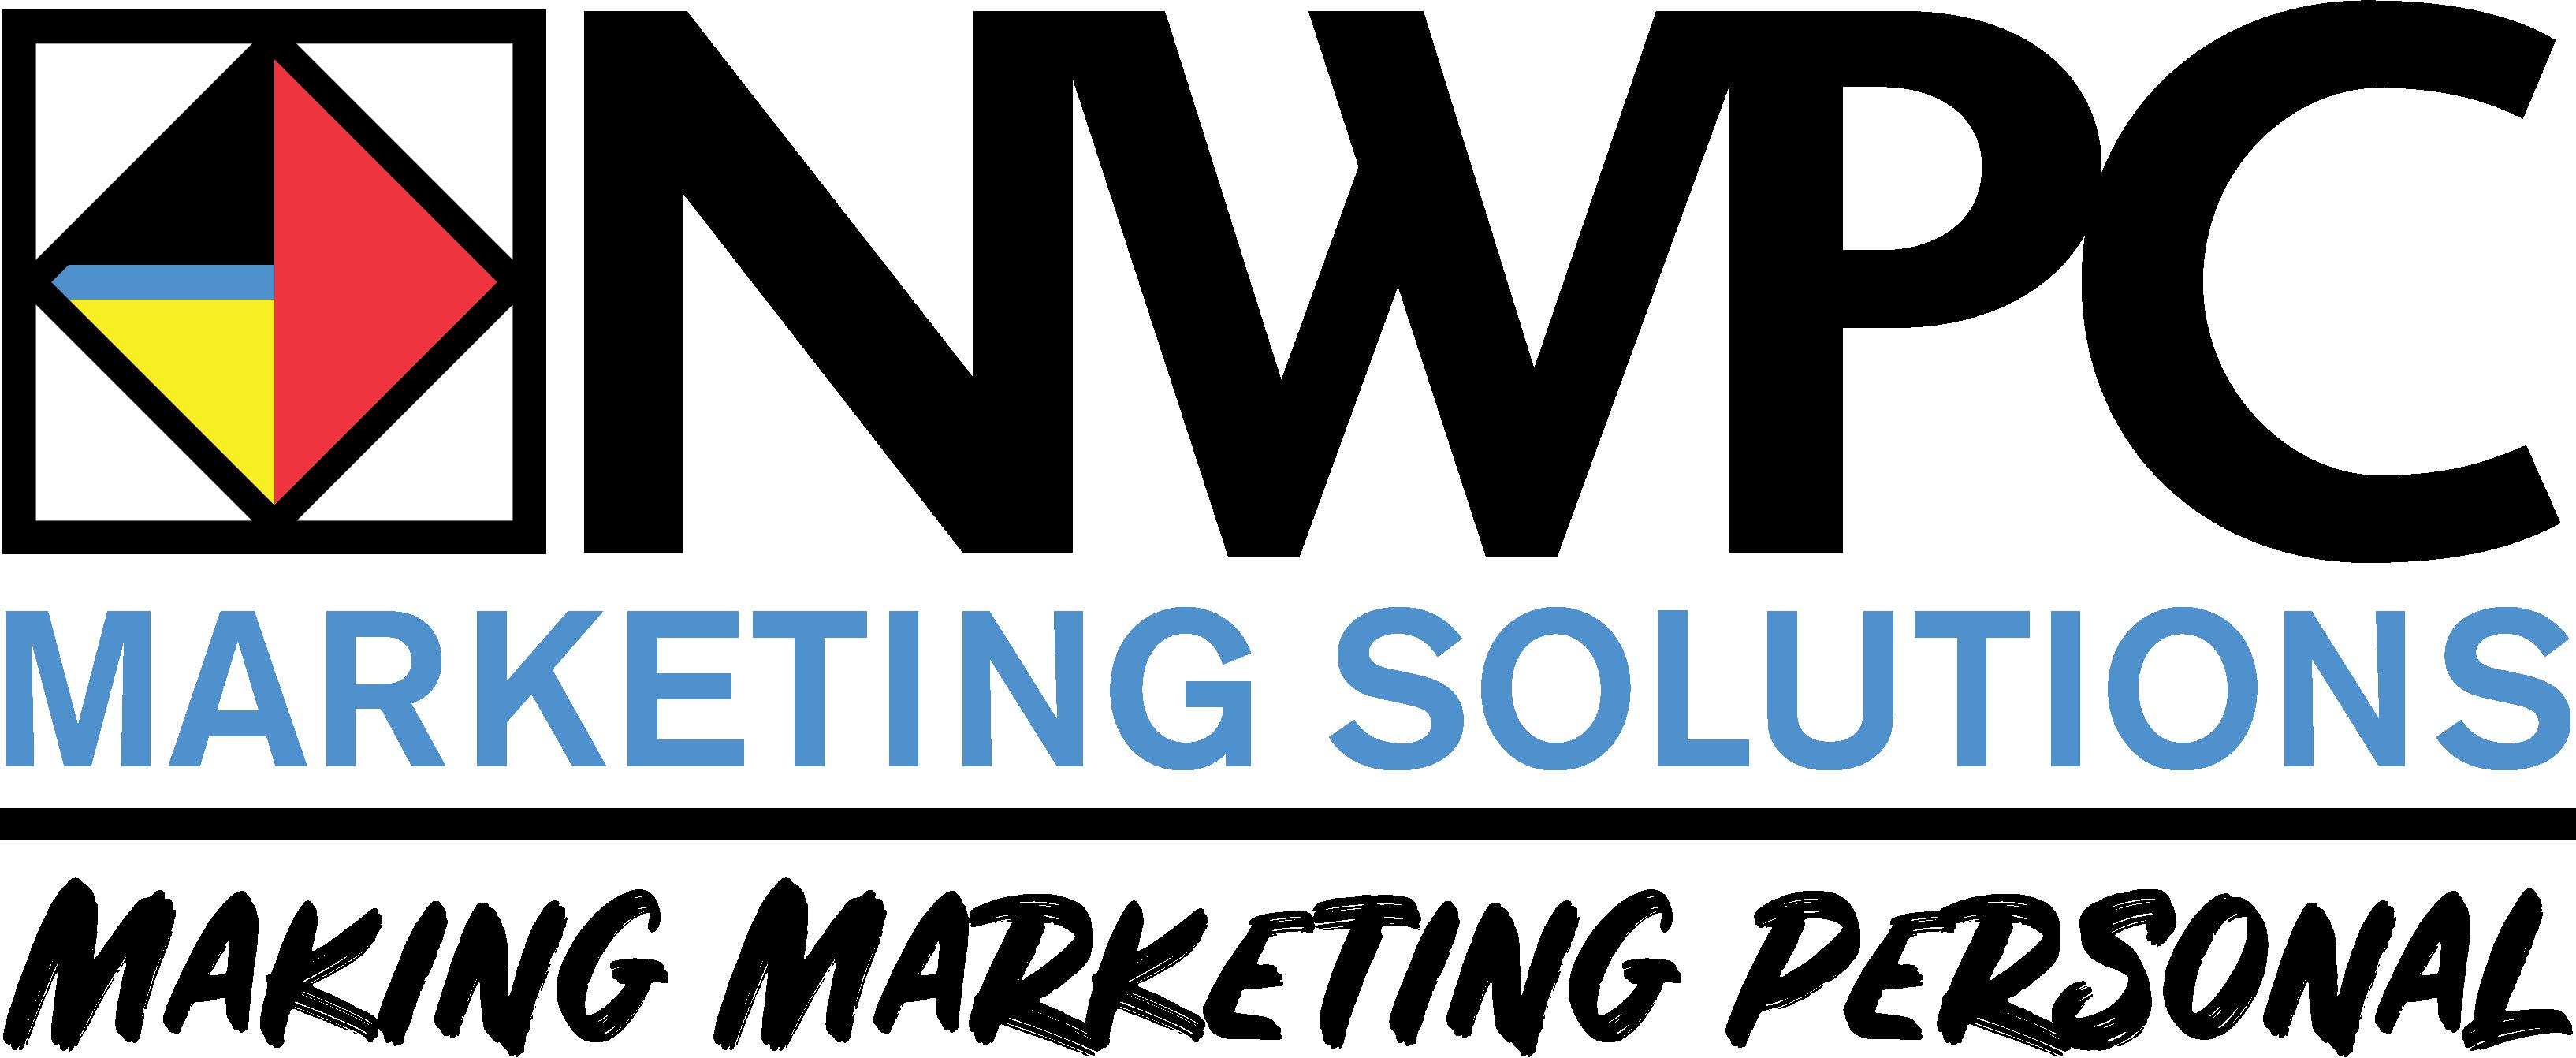 NWPC Marketing Solutions Making Marketi